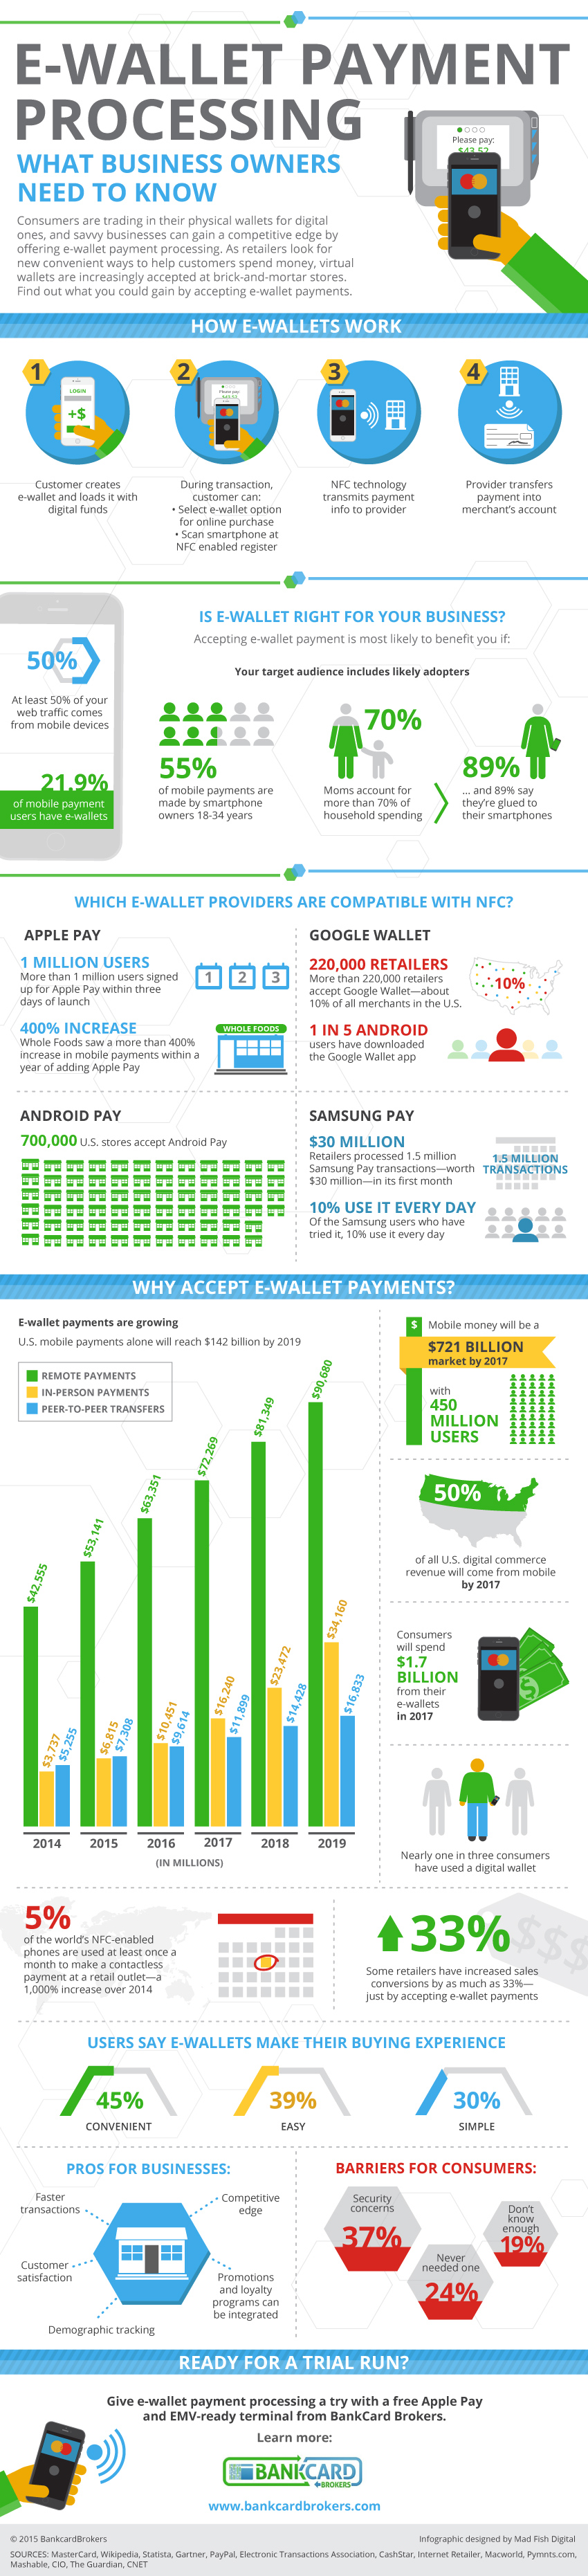 BCB_E-Wallet_Infographic